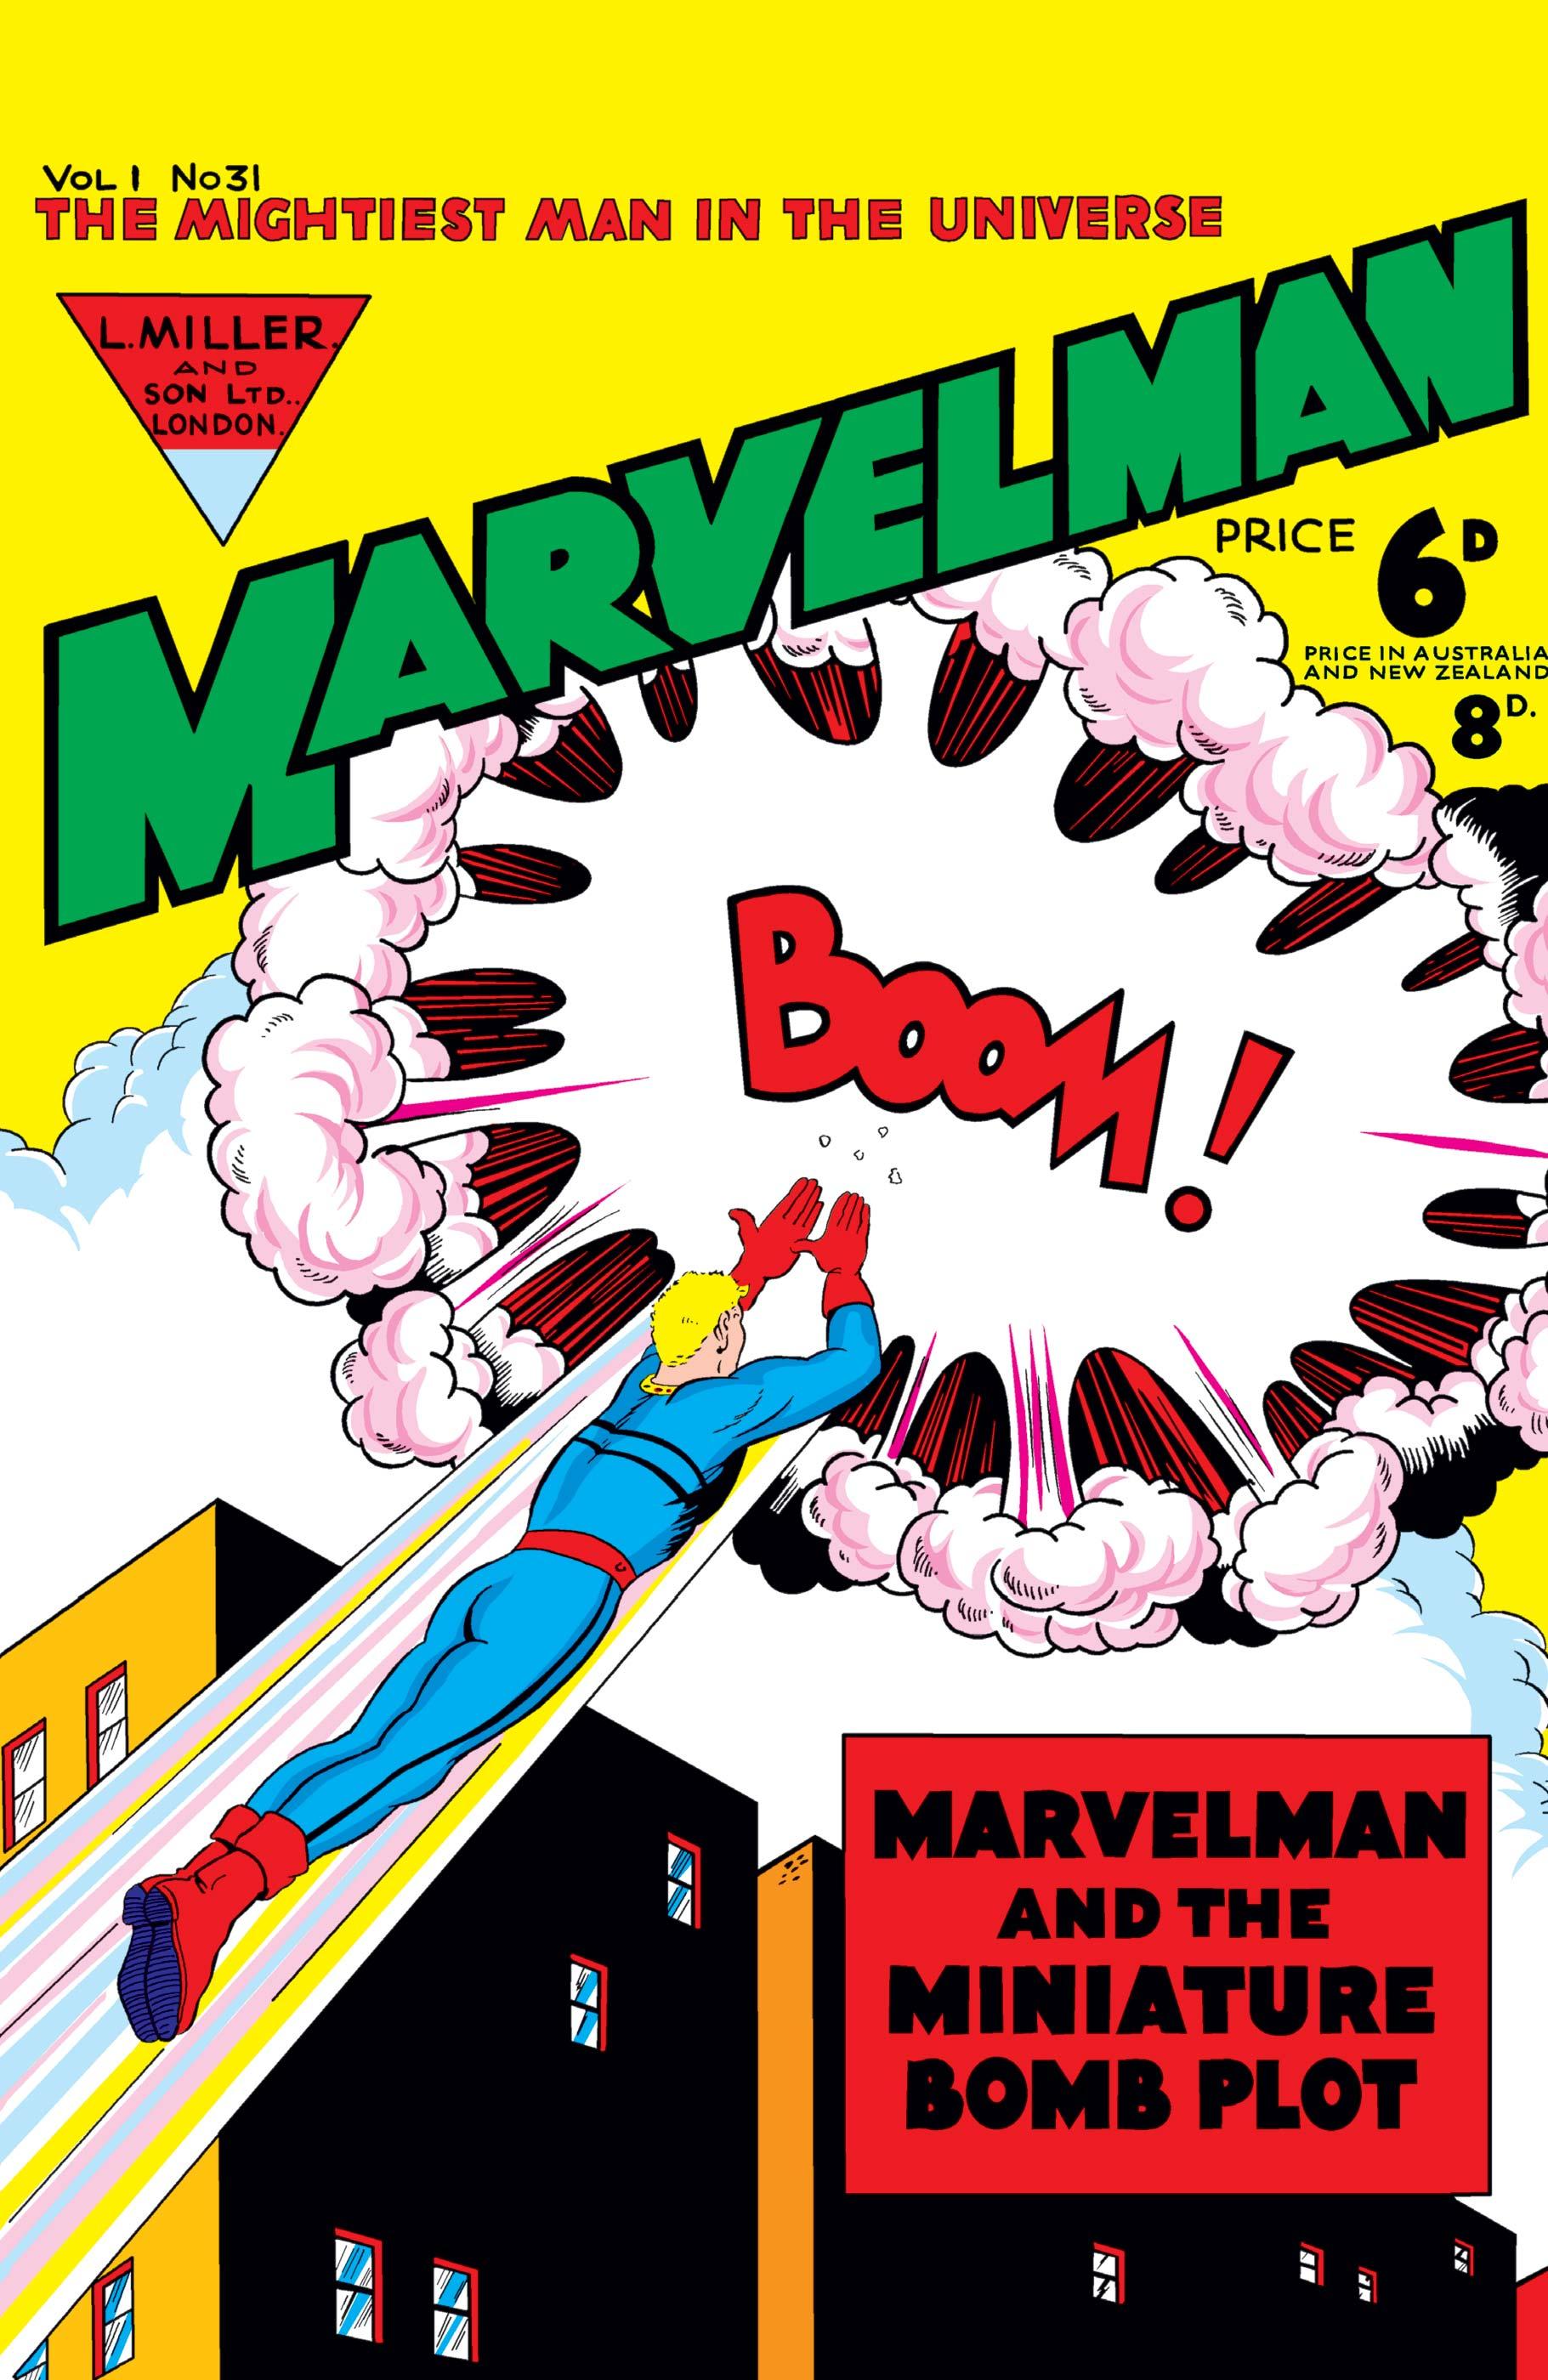 Marvelman (1954) #31